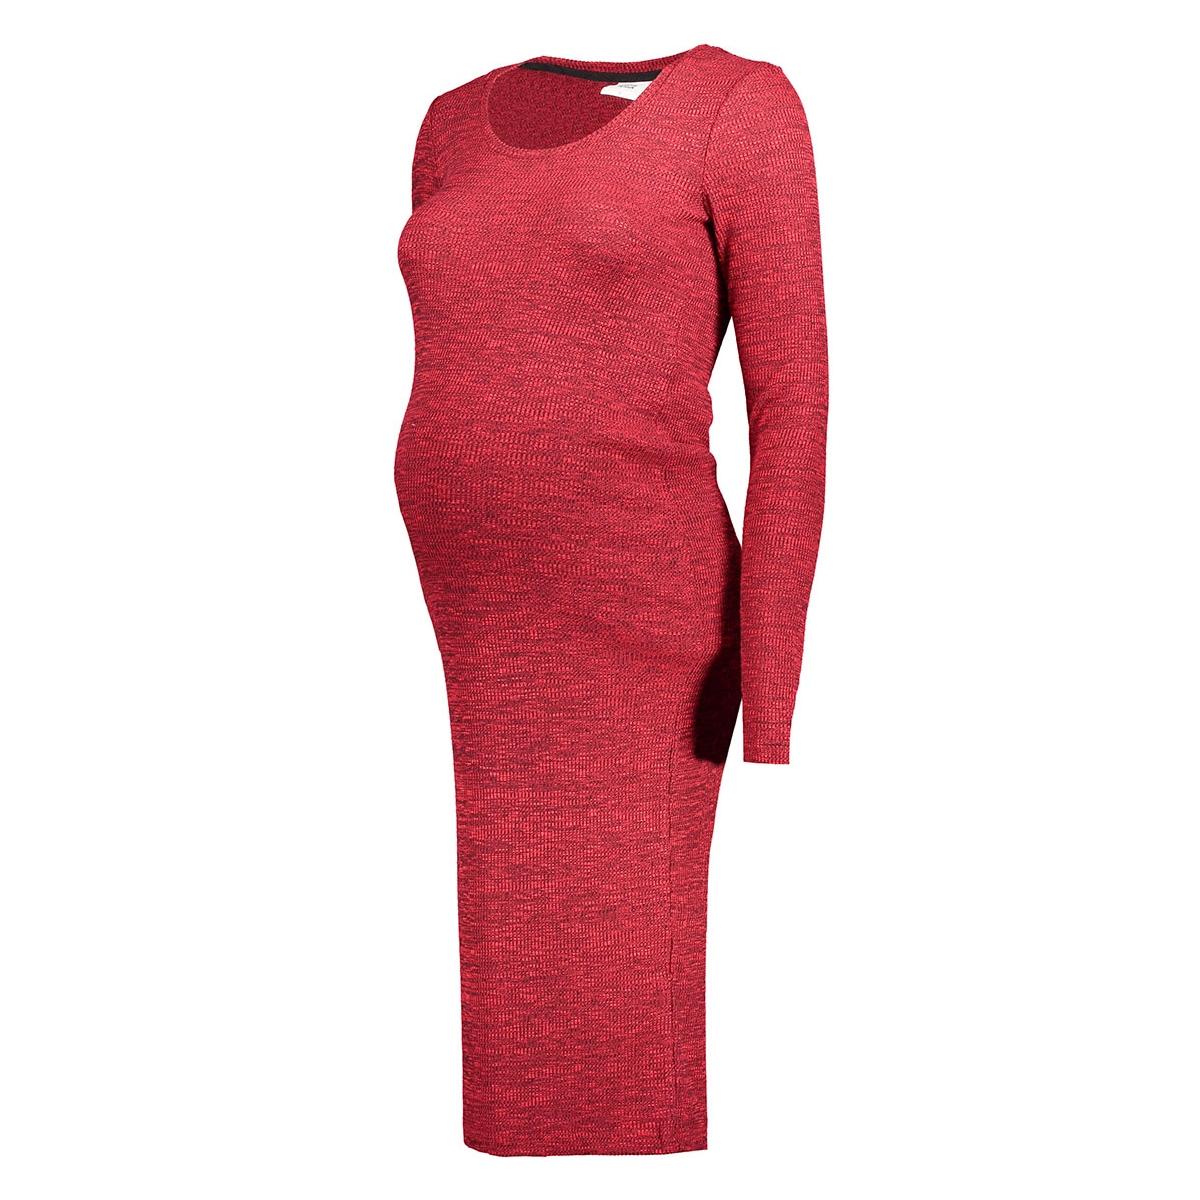 mlredo l/s rib knit dress 20006867 mama-licious positie jurk rio red